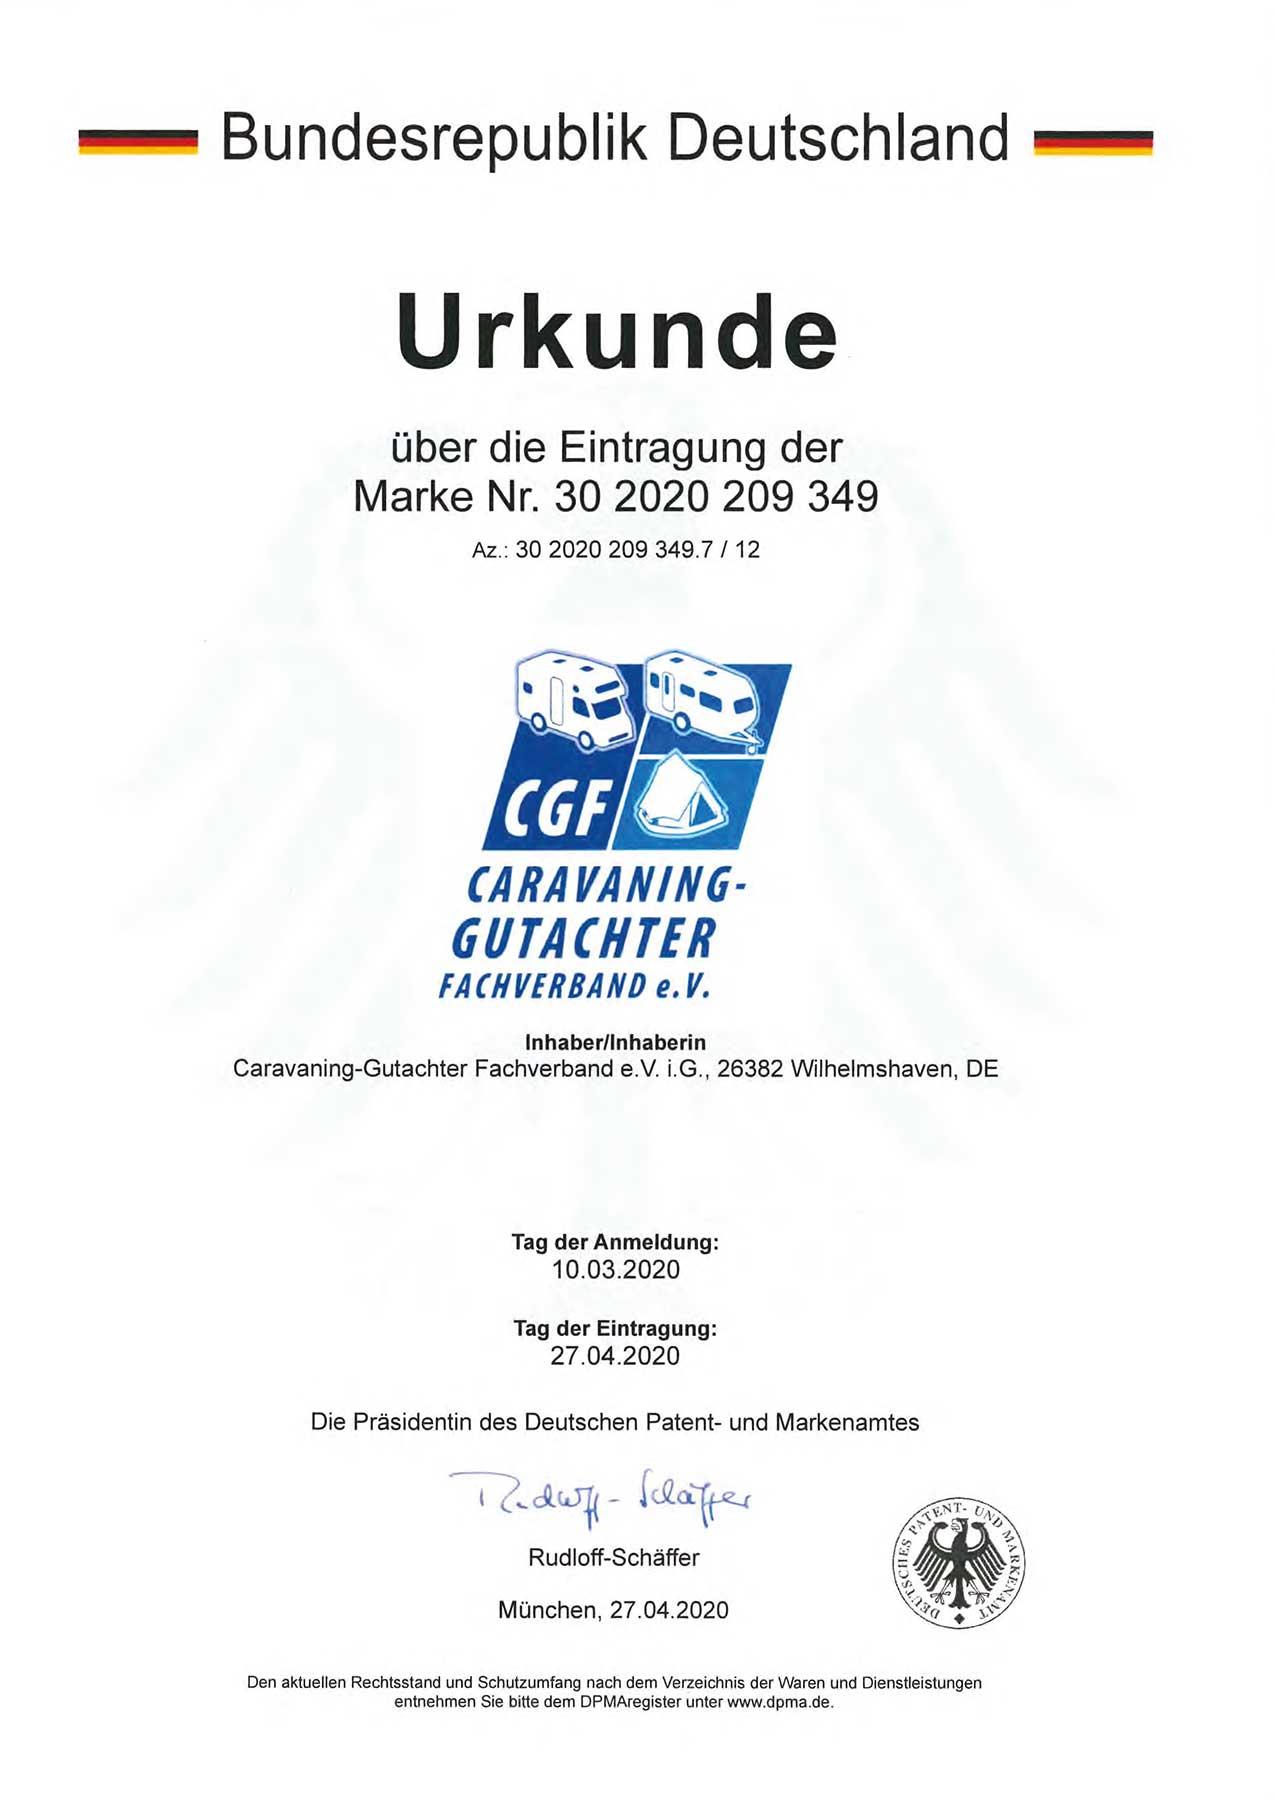 Patent eingetragene Marke